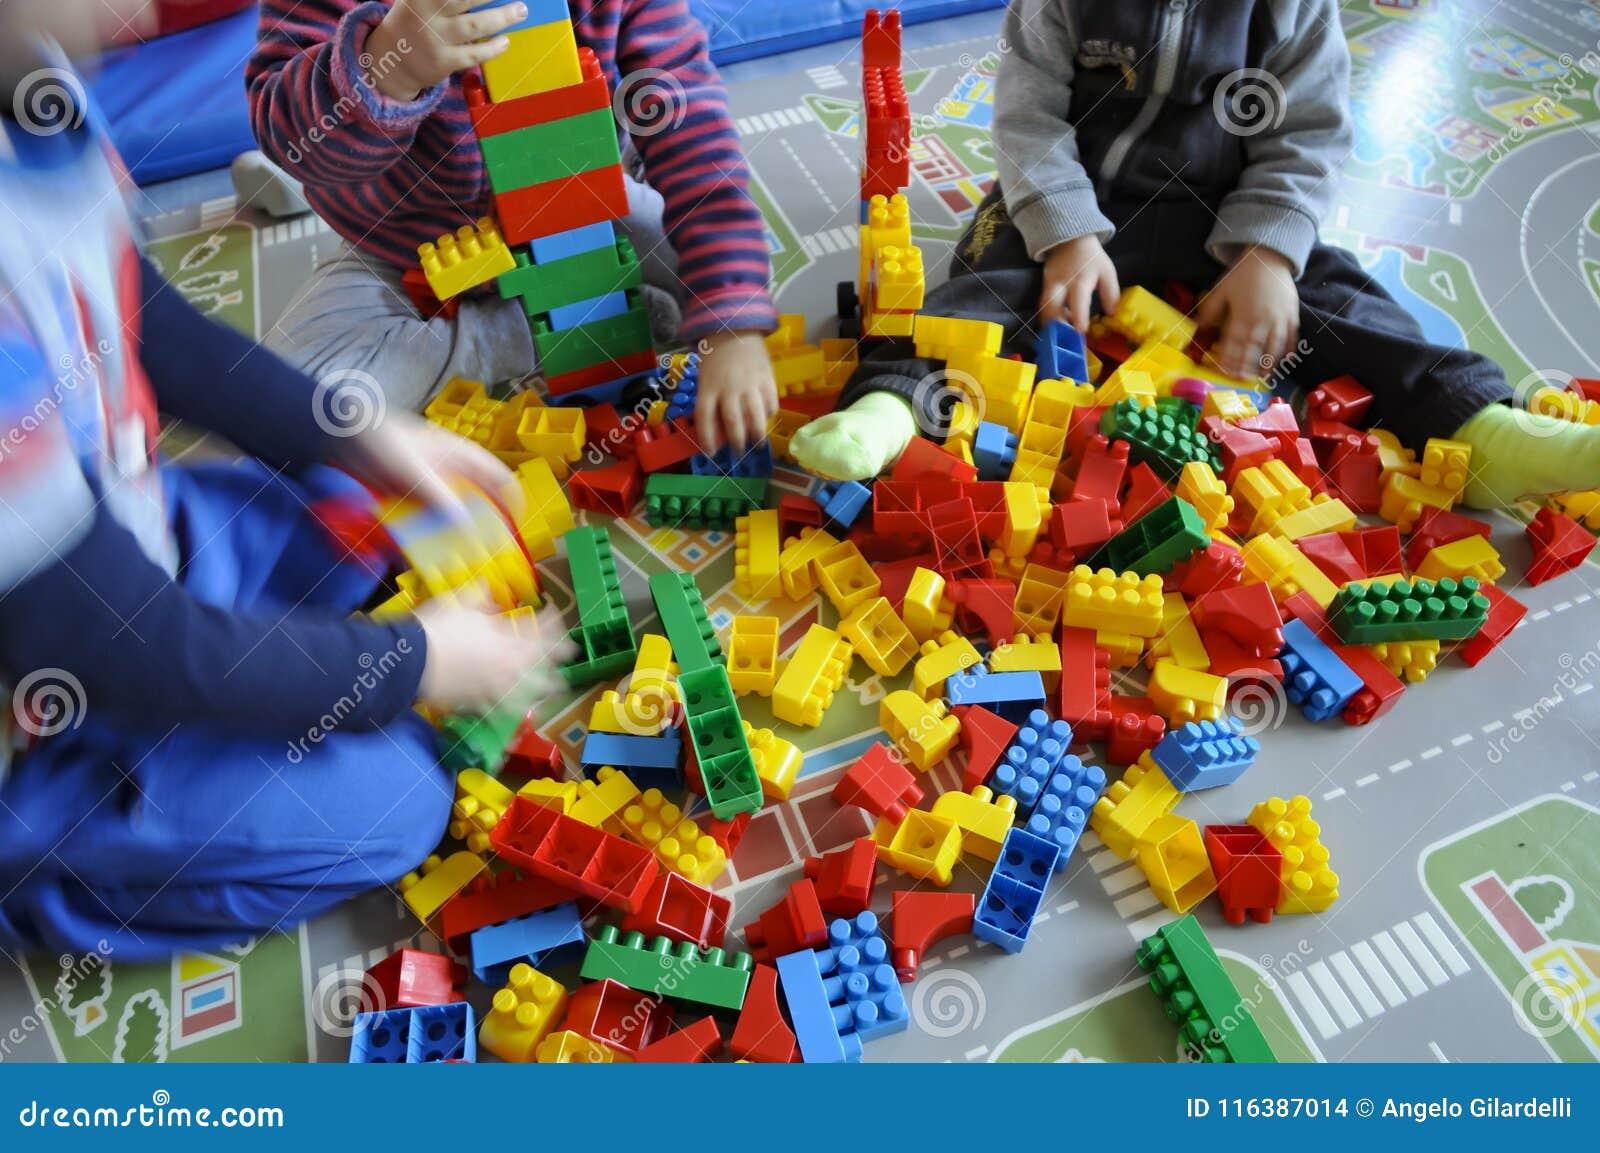 edca36e2b583 Δύο παιδιά που παίζουν στο πάτωμα Στοκ Εικόνες - εικόνα από άνθρωποι ...